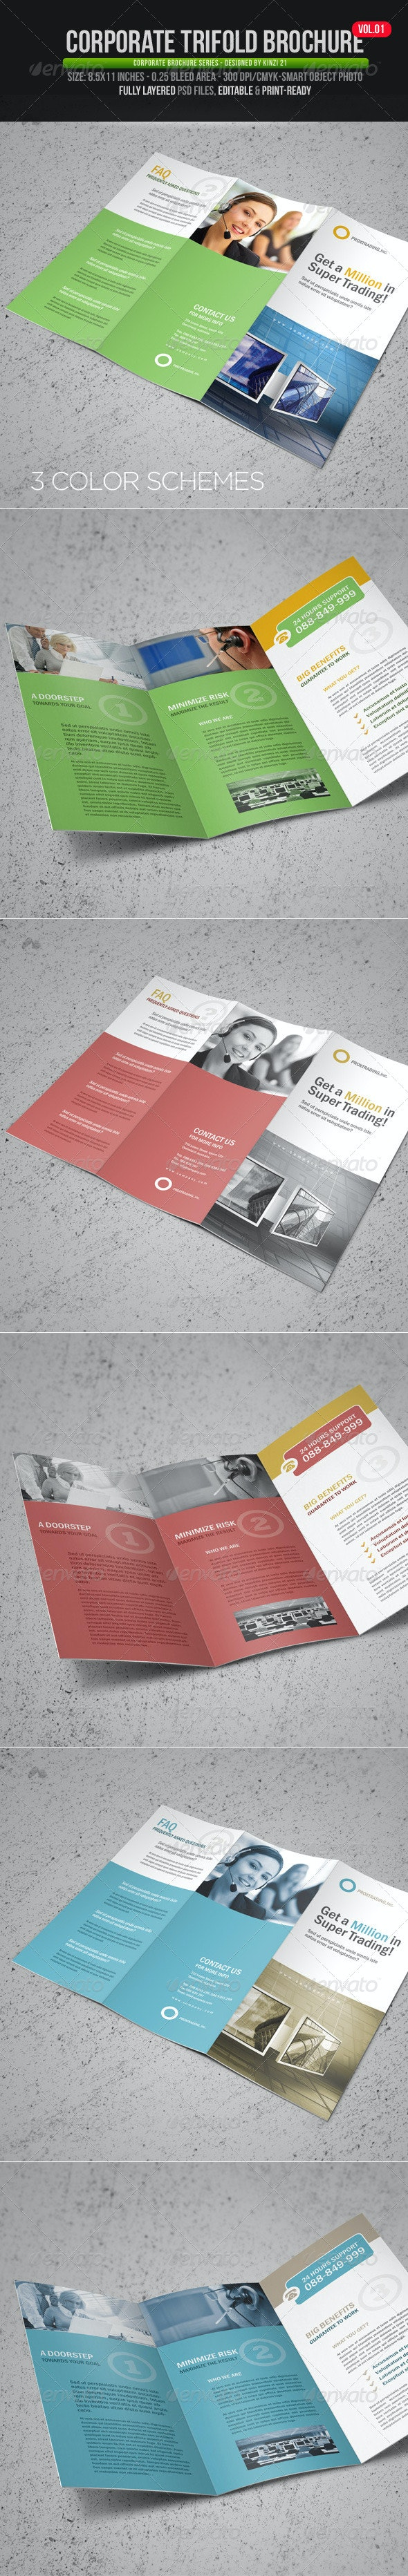 Corporate Trifold Brochure Vol.01 - Corporate Brochures